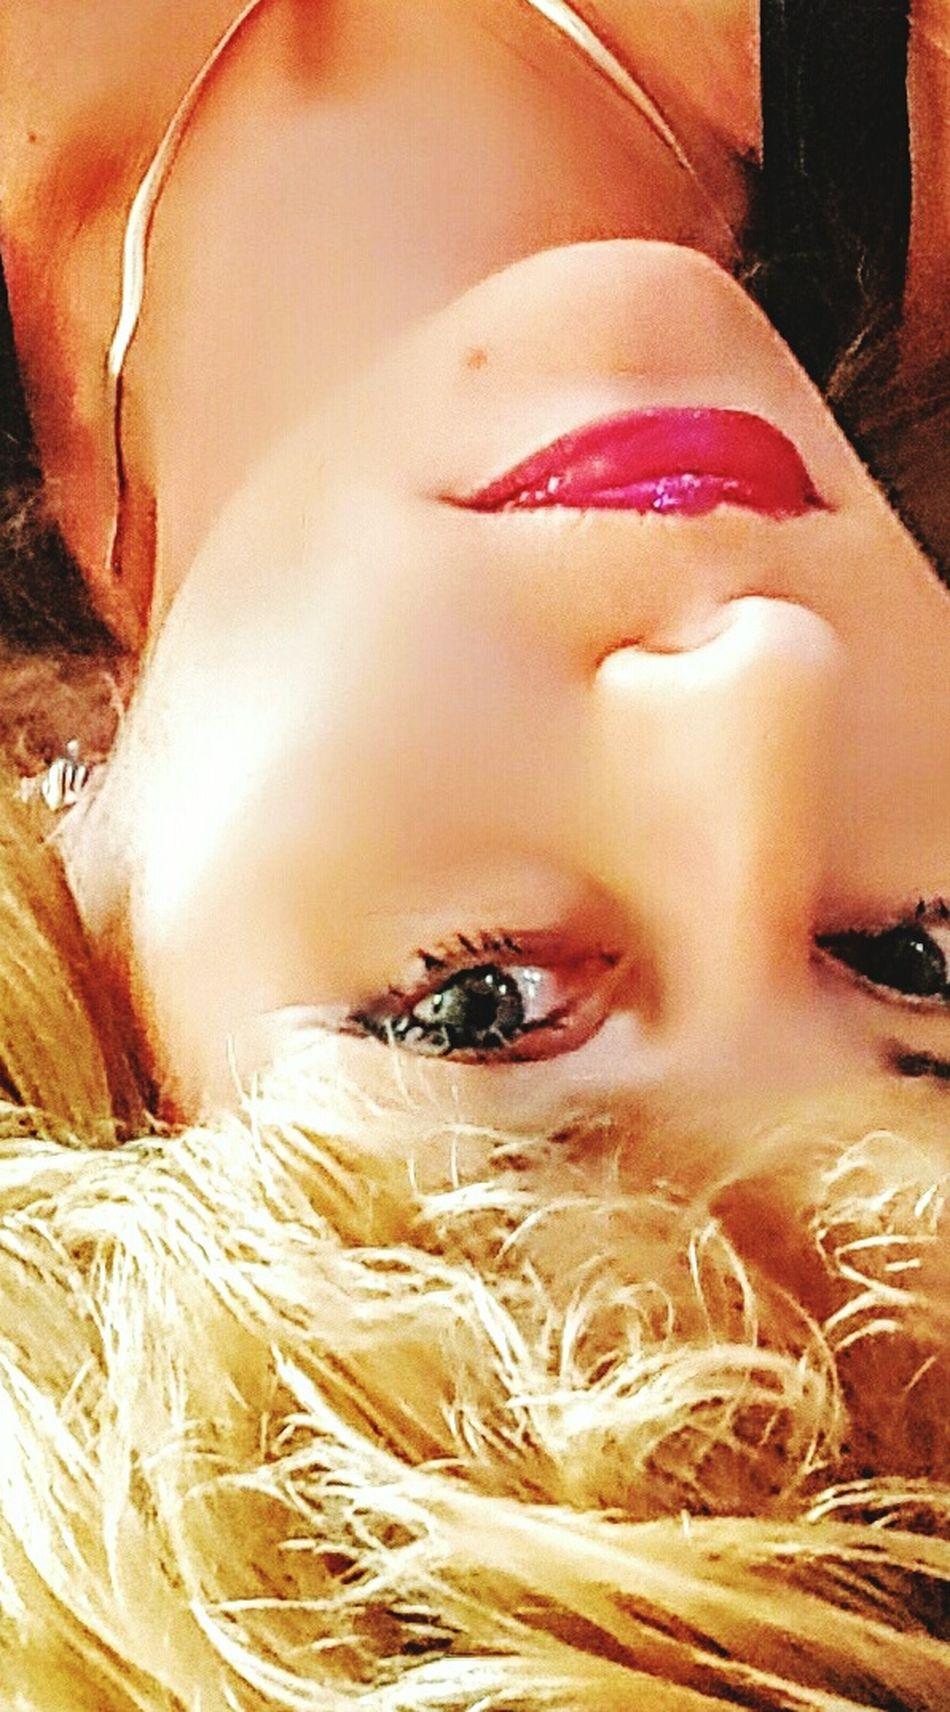 Cheese! Eye4photography  Selfportrait Inviting Freshness Need A Valentine ❤ Eyeem Enchanting Shots Eyefordramatics Magicformyfriends fashion style stylish love TagsForLikes me cute photooftheday nails hair beauty beautiful instagood insta Successful Havehadabiglife